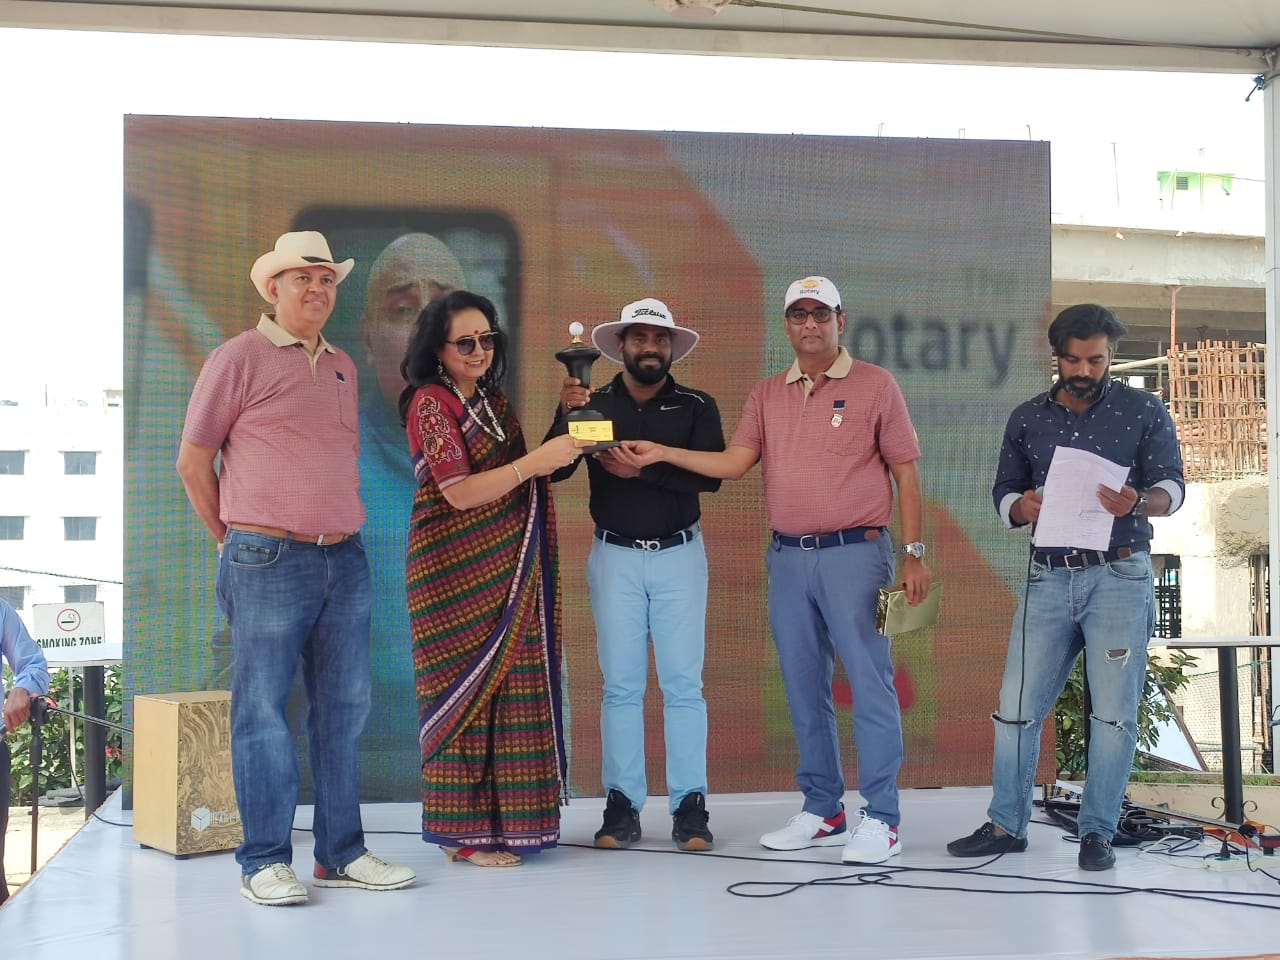 Award for Longest drive award being presented by Tejdeep Kaur Menon to Vijay Kumar Reddy.